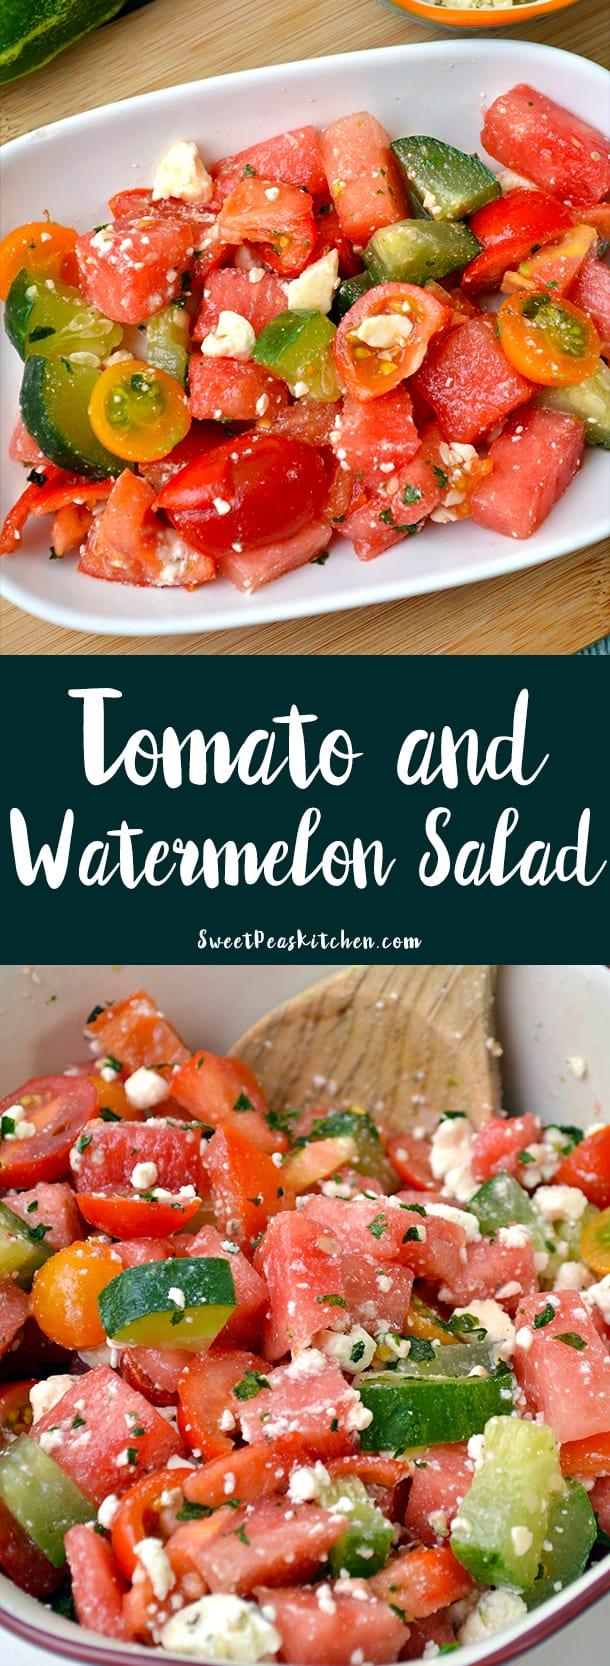 Tomato and Watermelon Salad